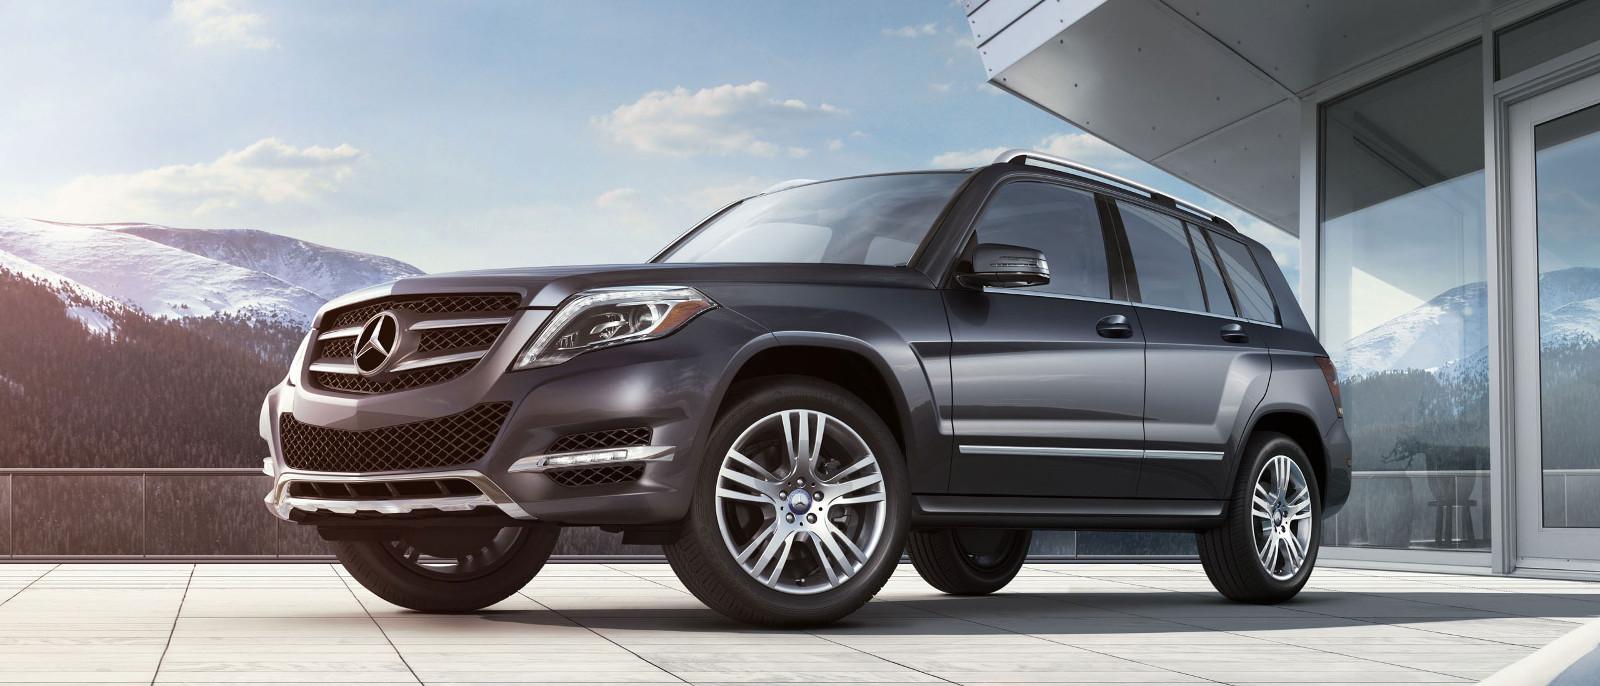 2015 Mercedes-Benz GLK Exterior parked